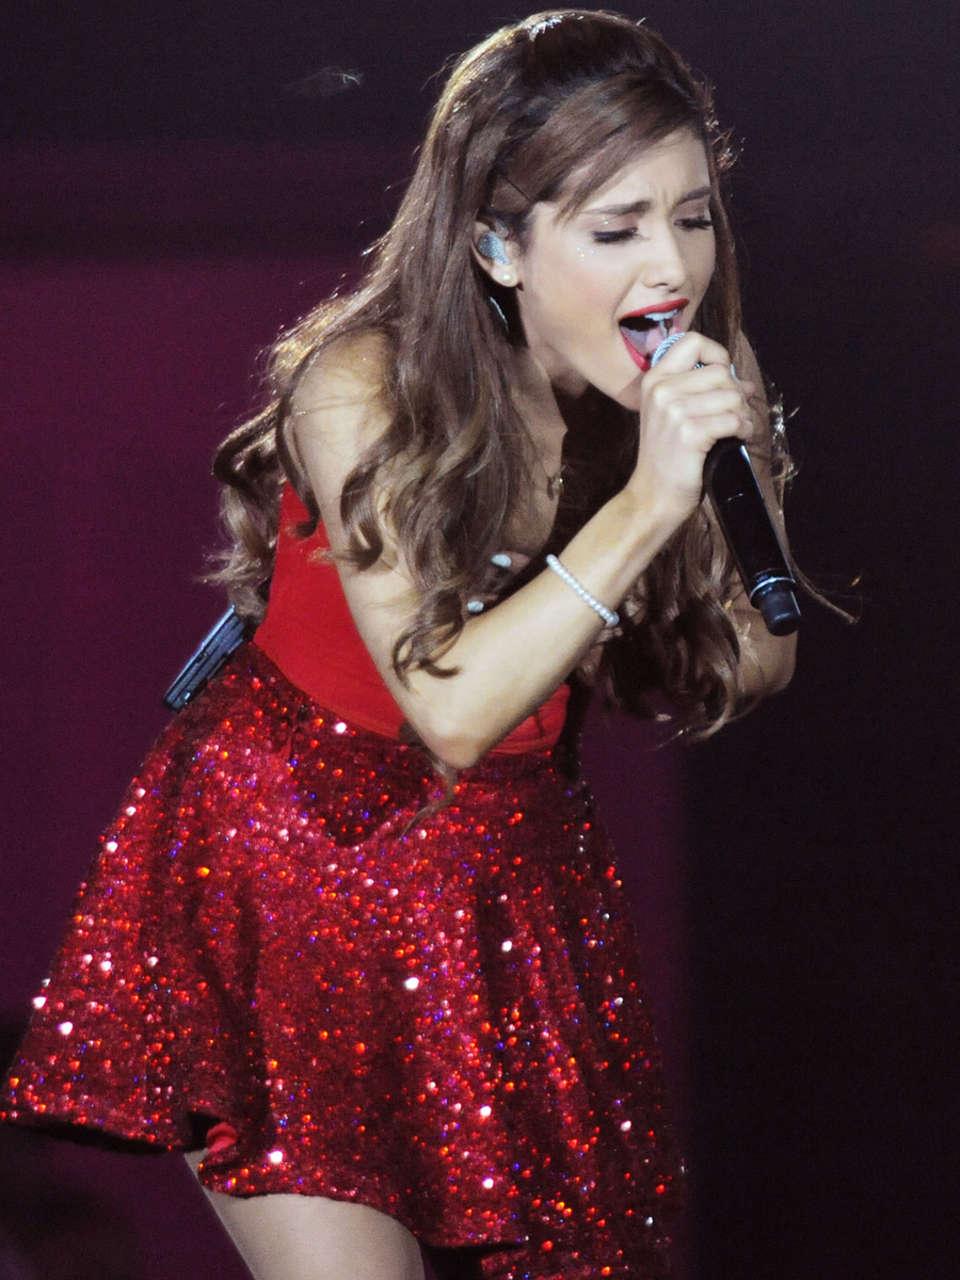 Ariana Grande Concert With Justin Bieber In Atlanta 02